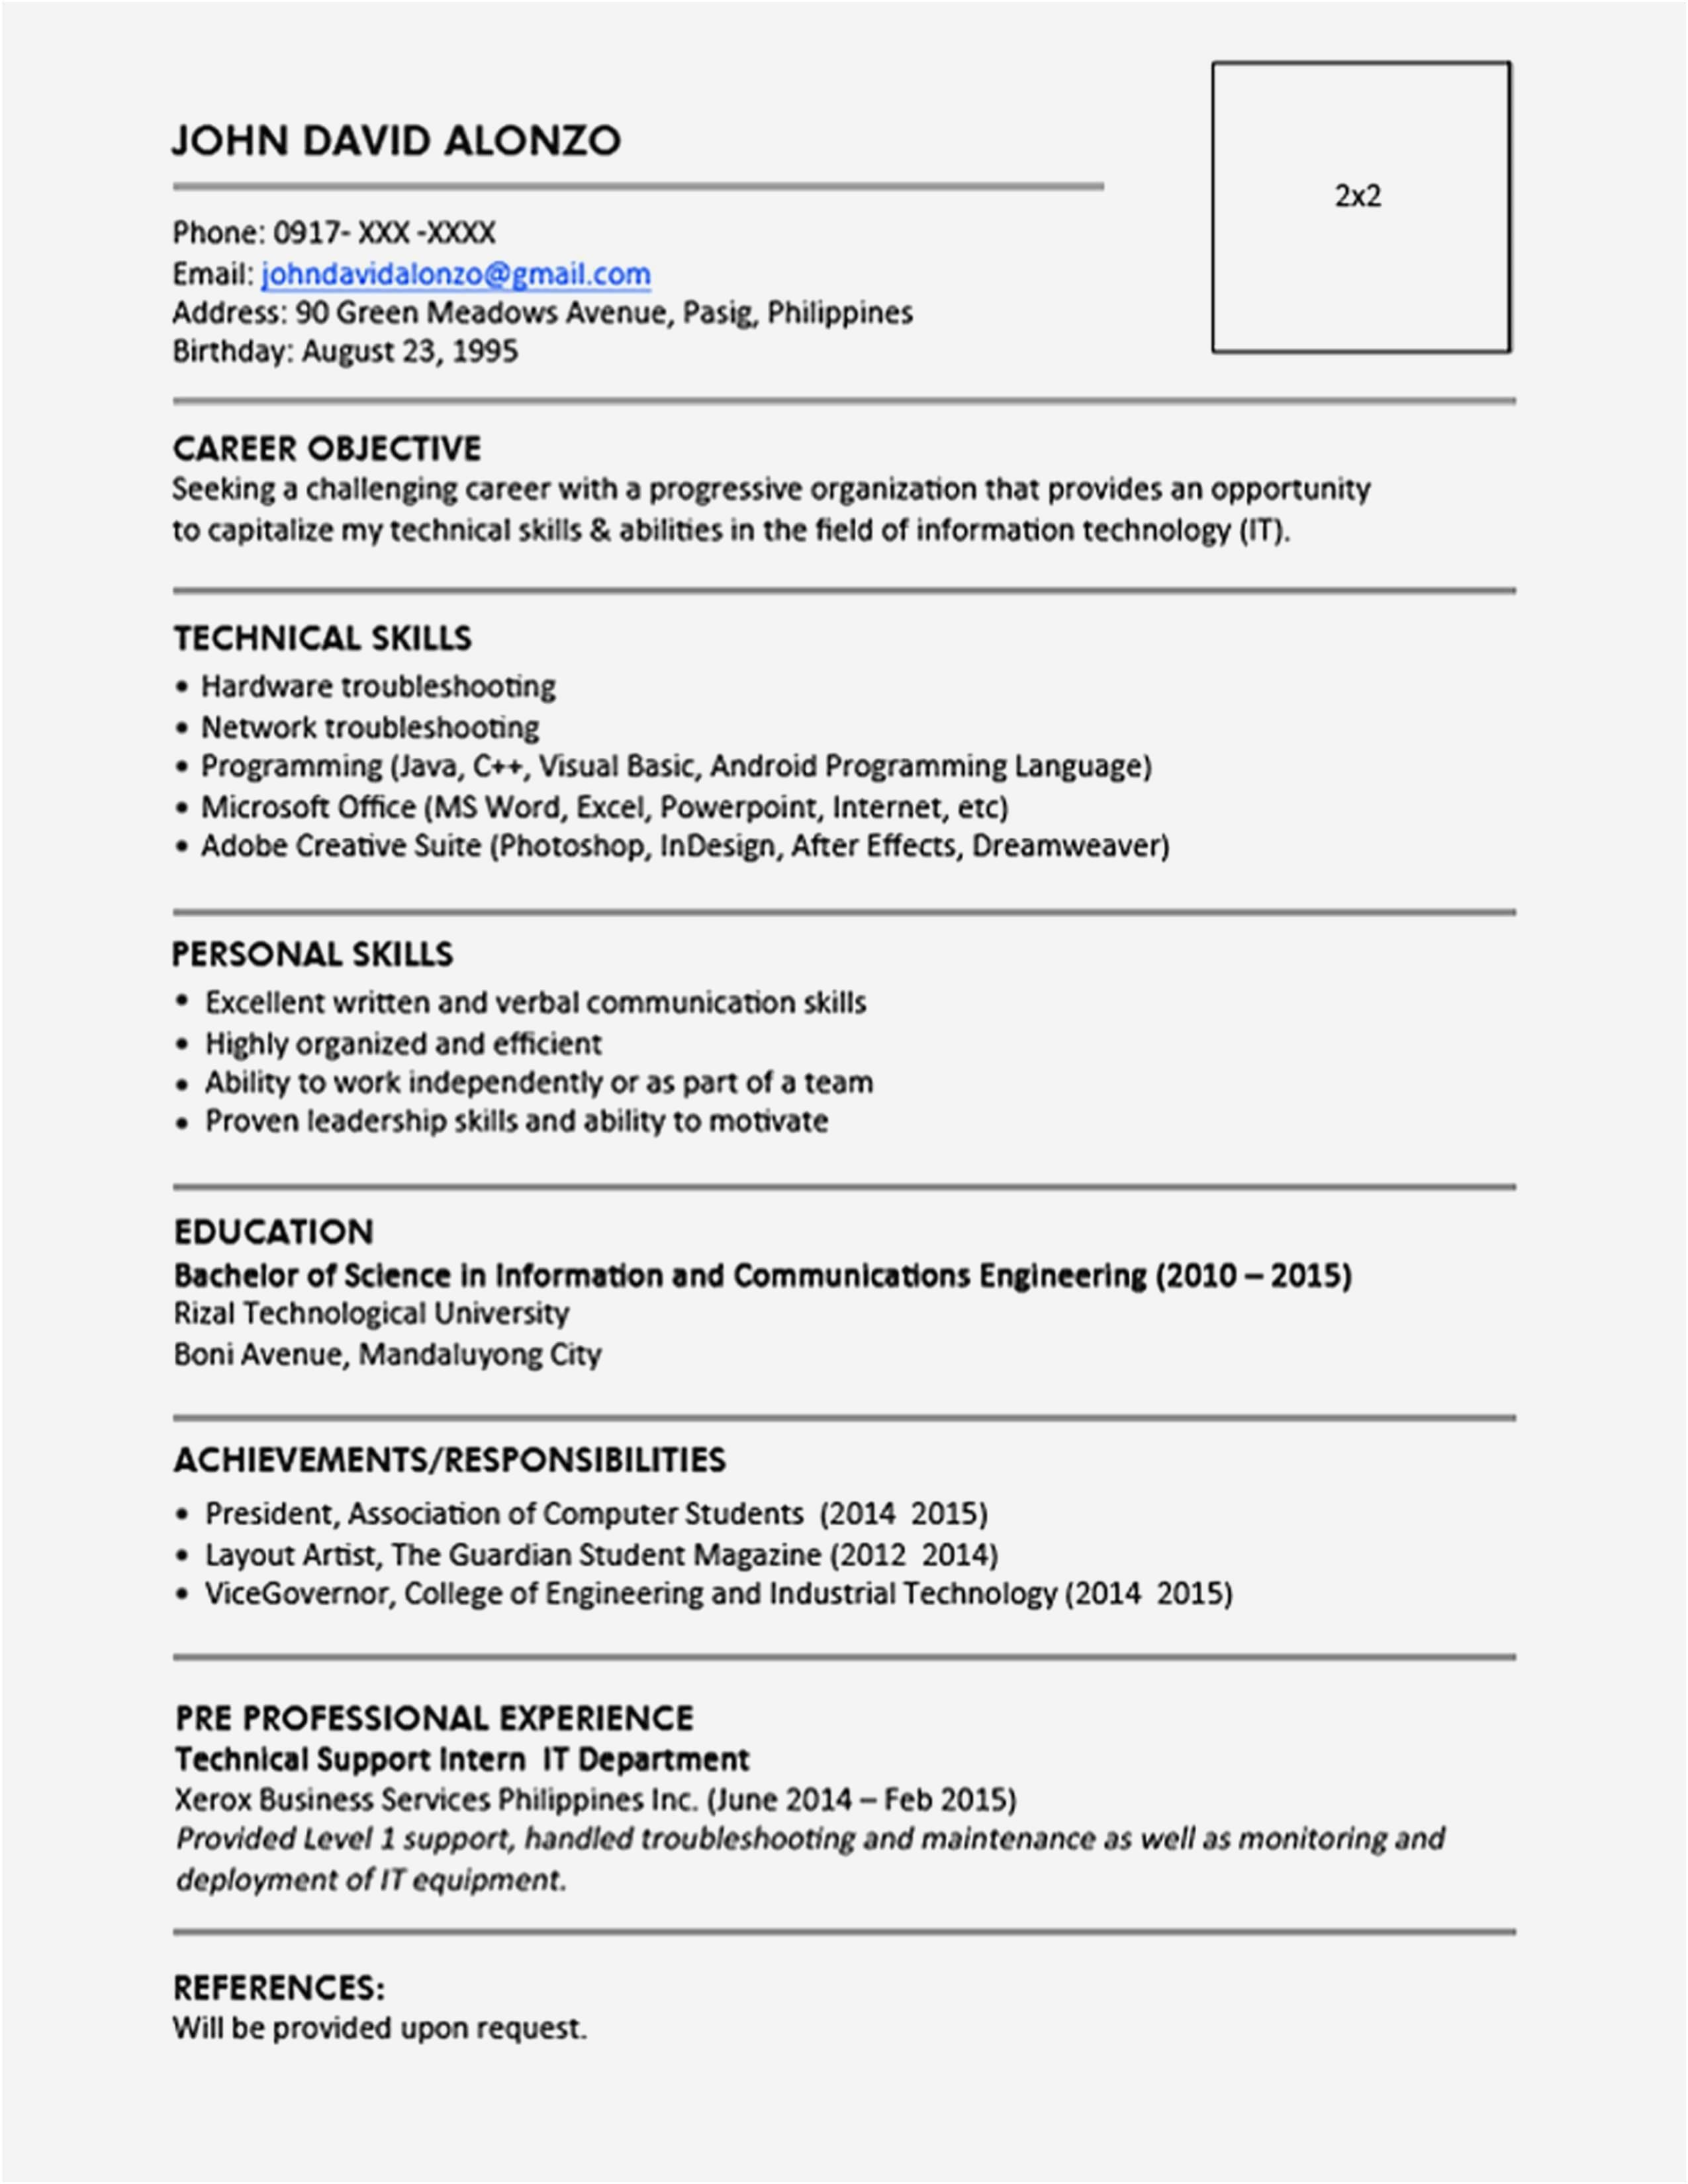 exemple de cv maroc pdf gratuit